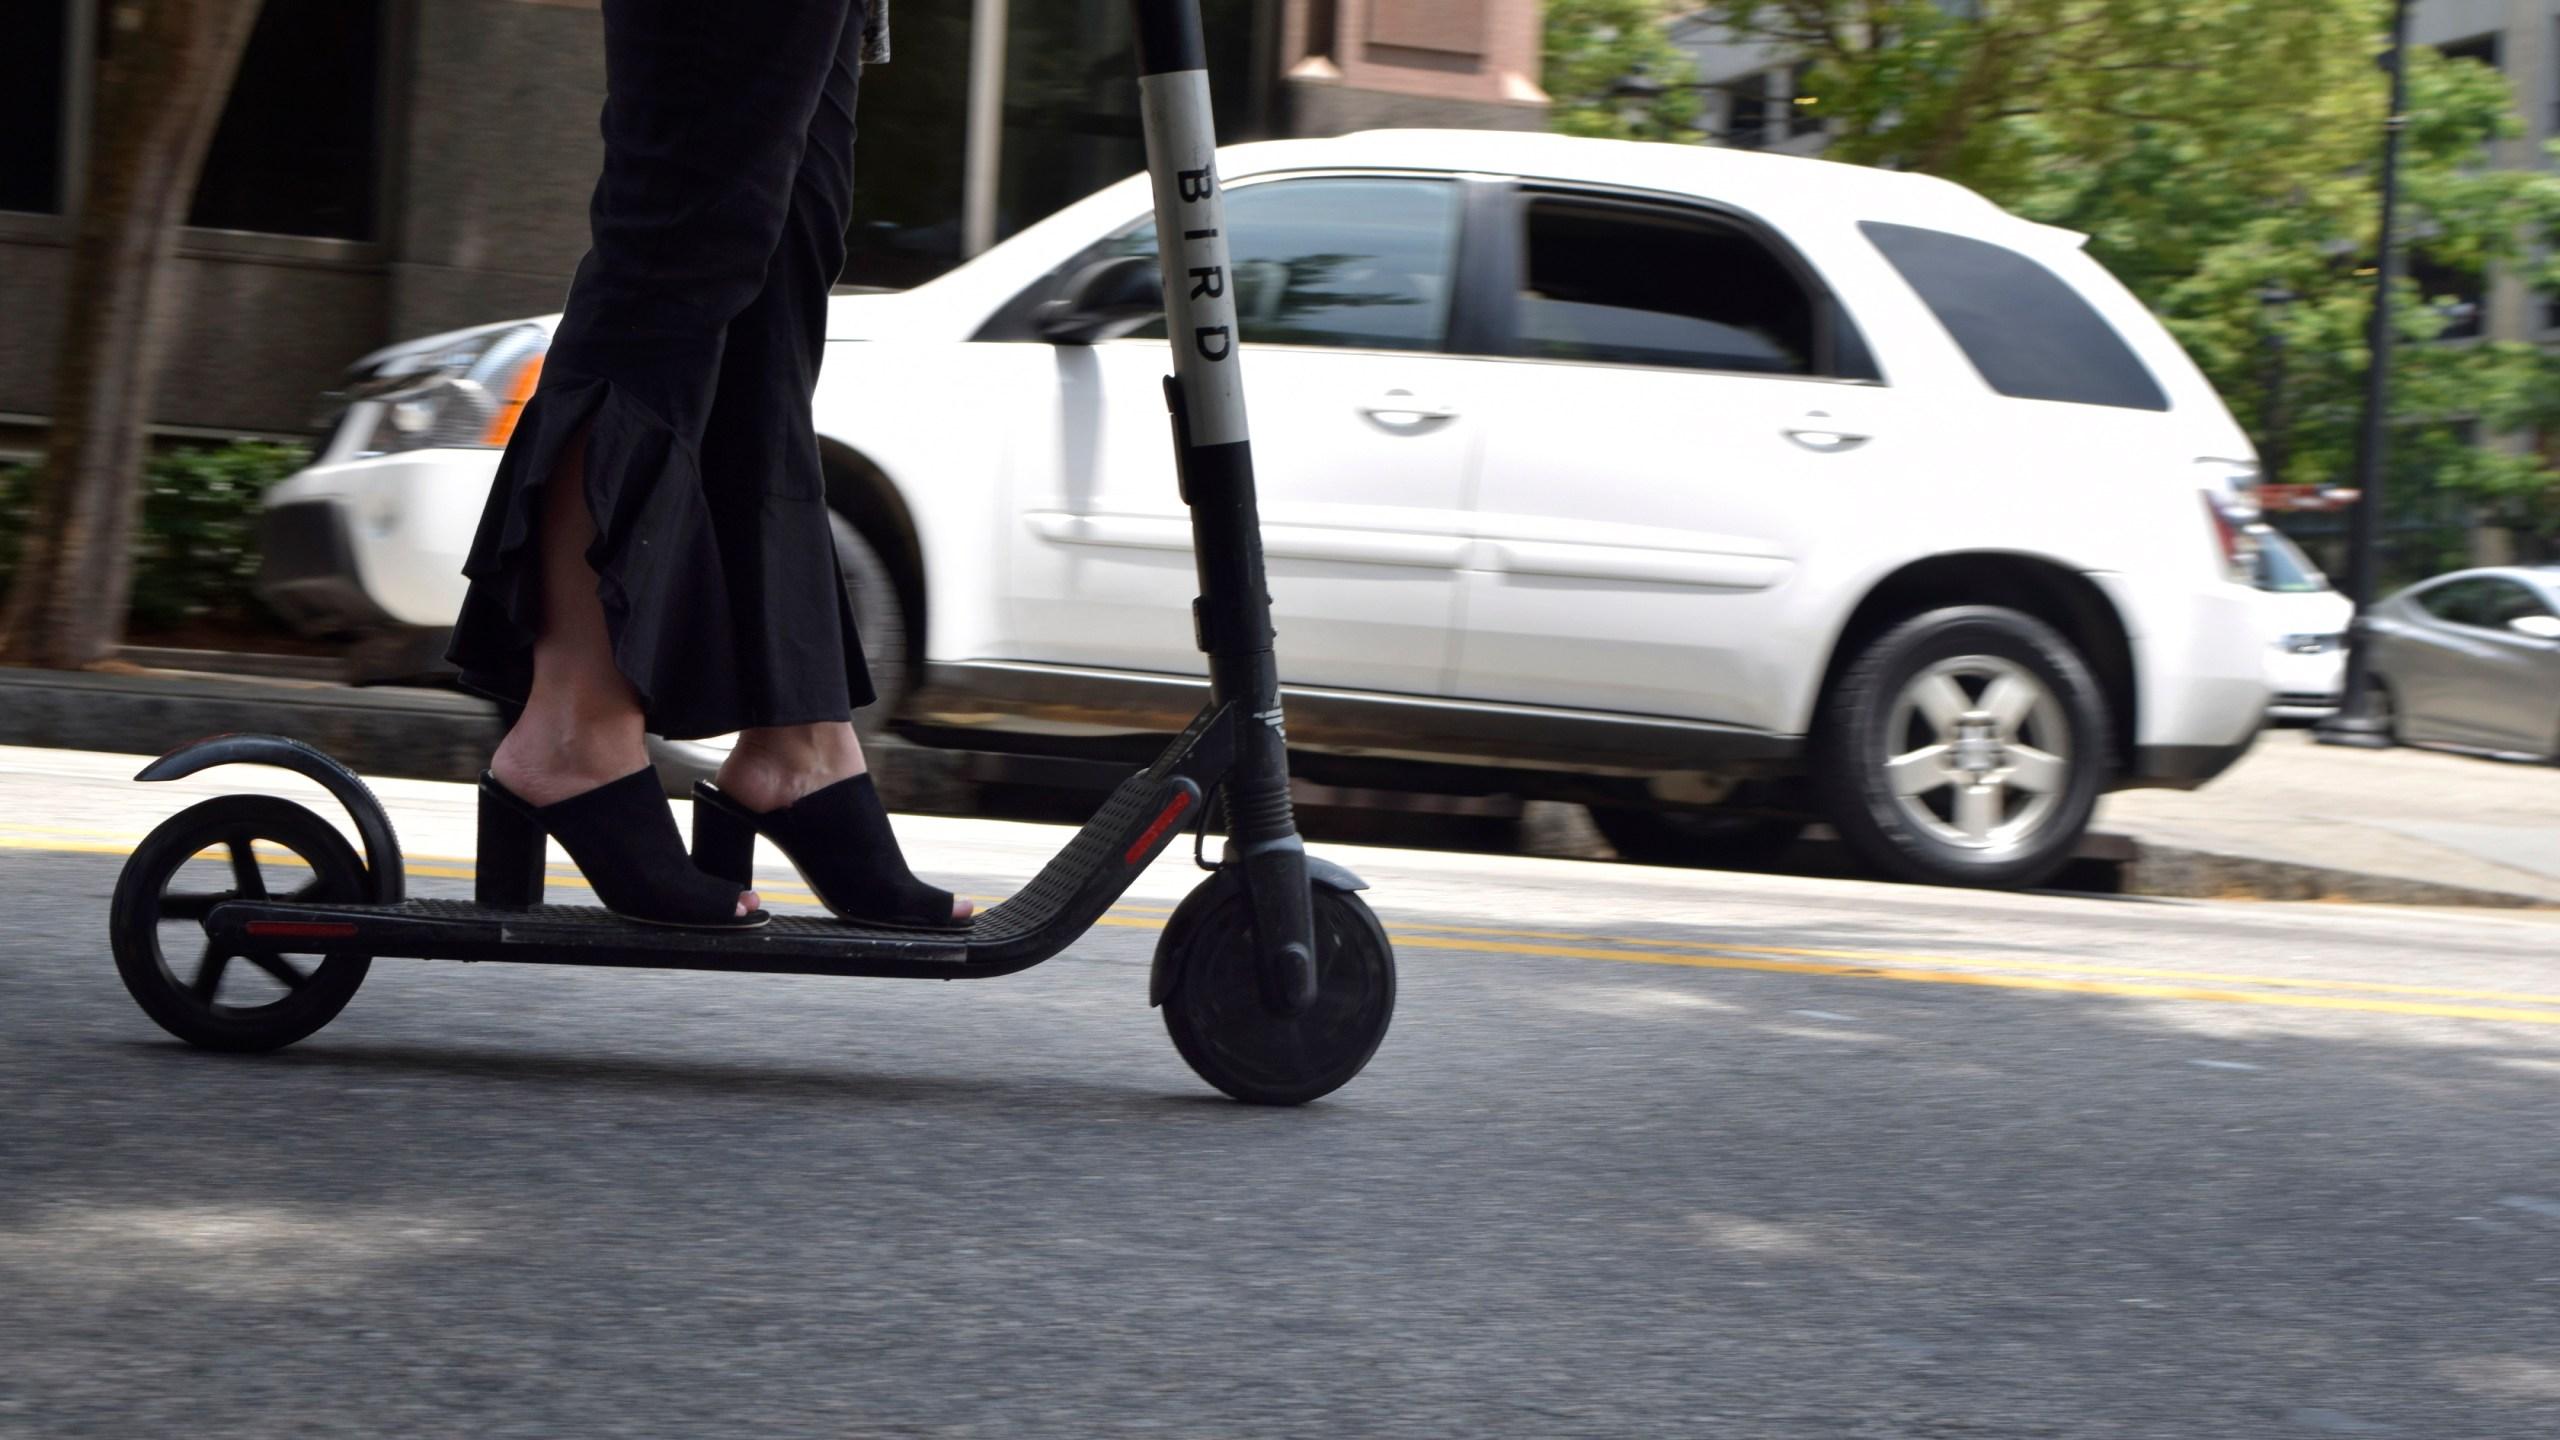 Scooter_Injuries_34938-159532.jpg48259700